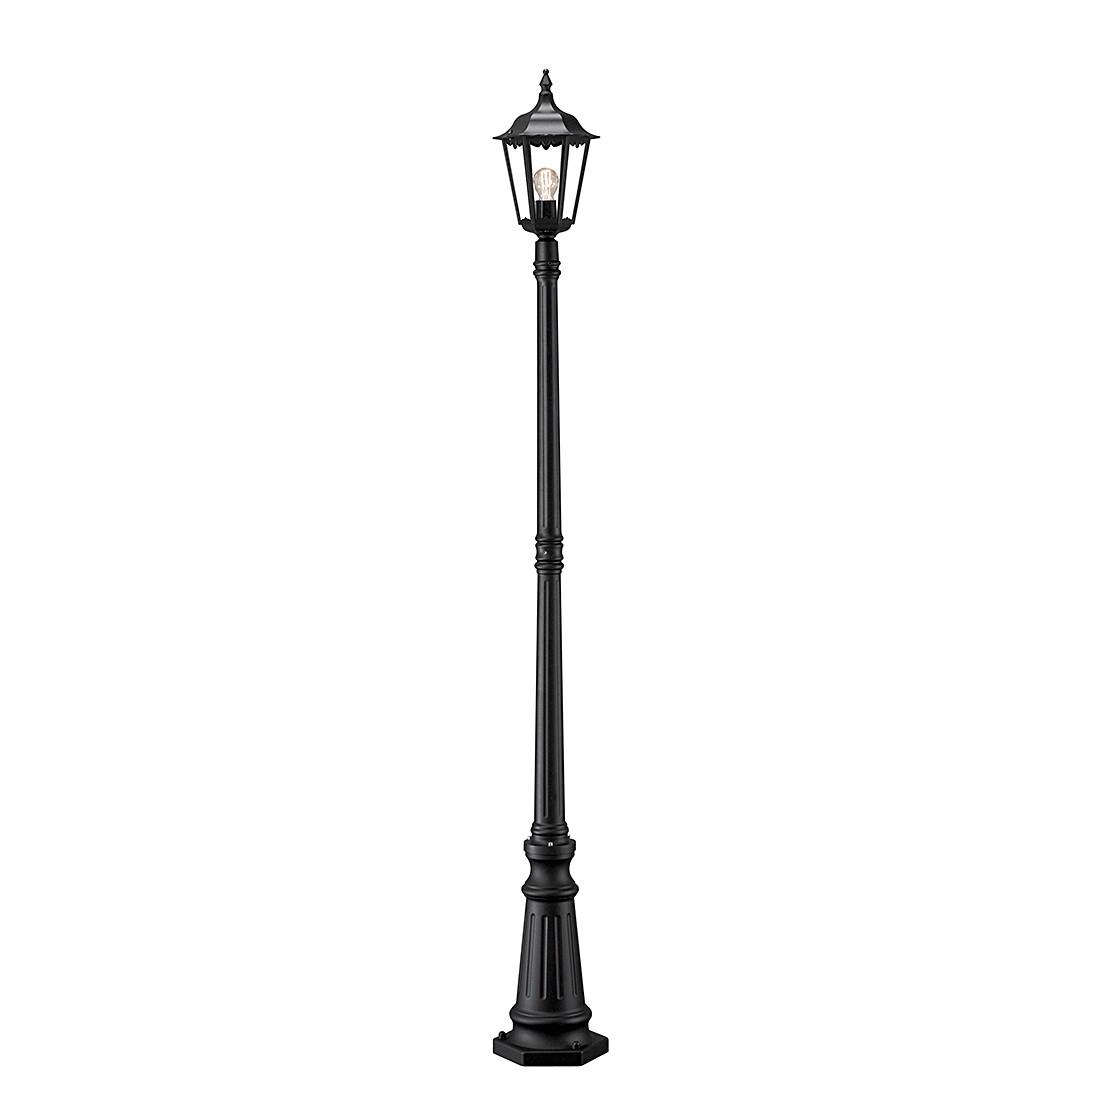 EEK A++, Lampadaire Firenze - Aluminium / Verre 1 ampoule, Konstsmide